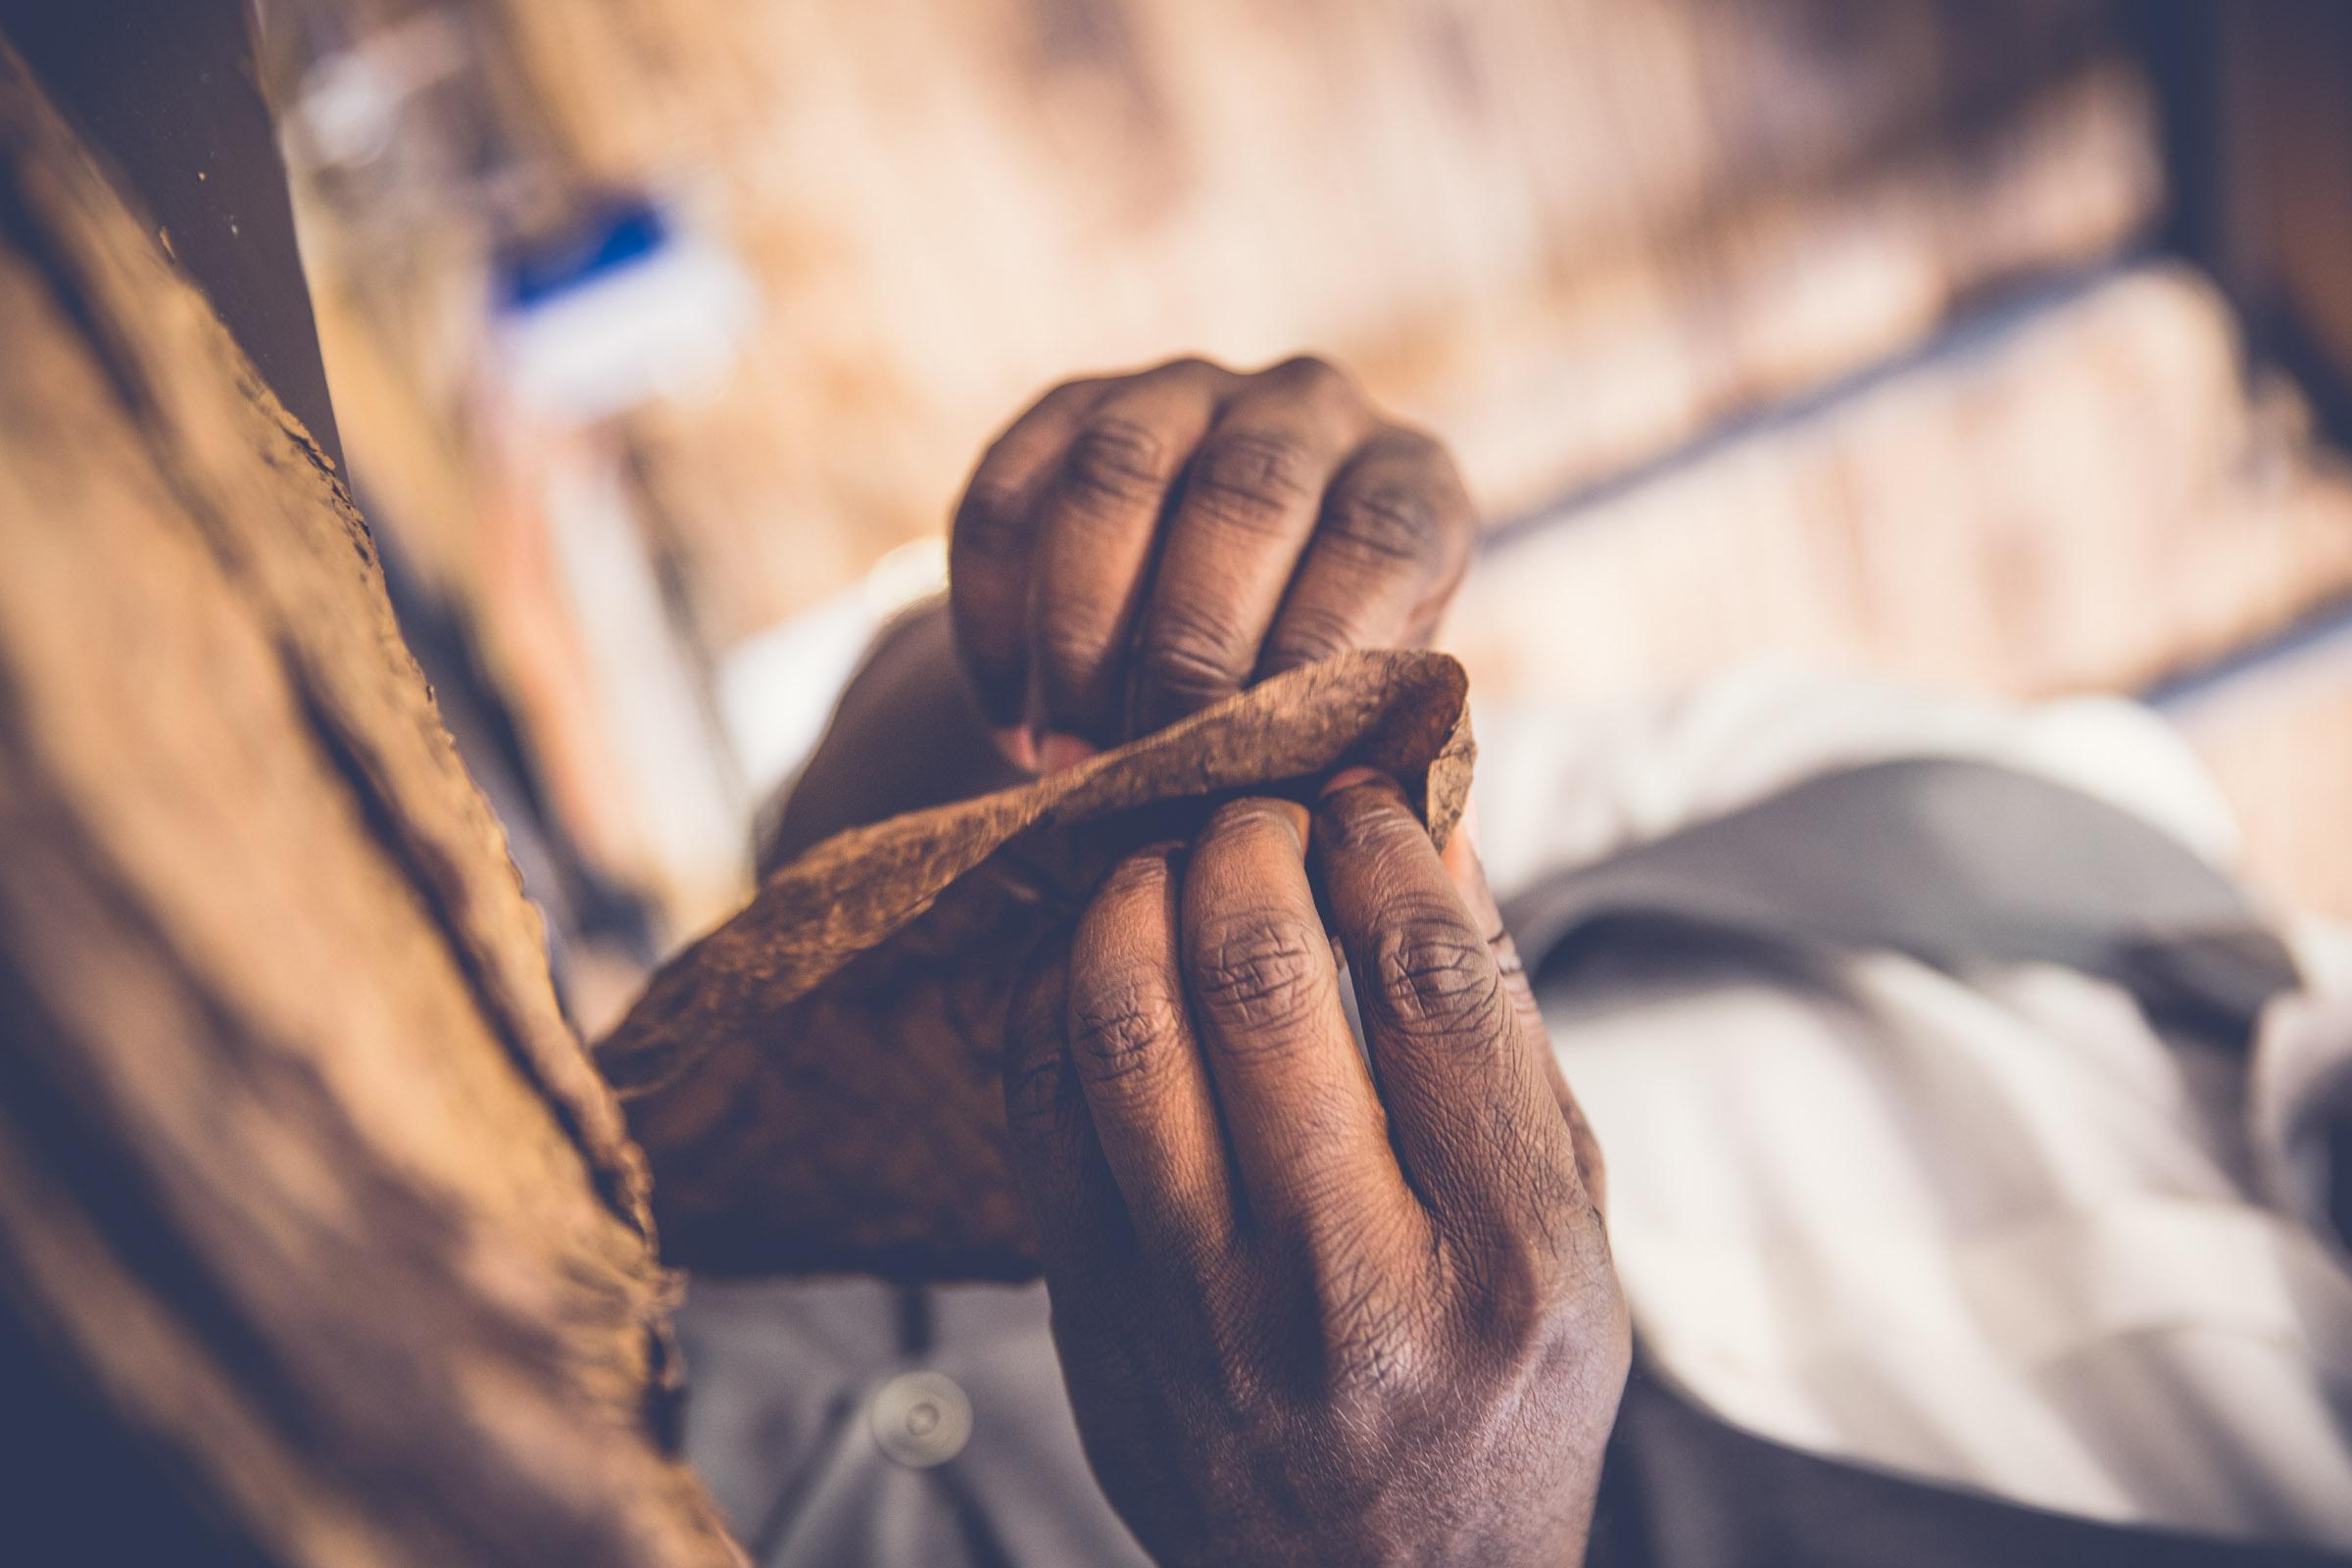 Zigarrenroller - Zigarrenrollerin | Zigarrendreher | Zigarrenherstellung | Hochzeit | Messen | Gala |Event | Buchen | Mieten | Anfragen